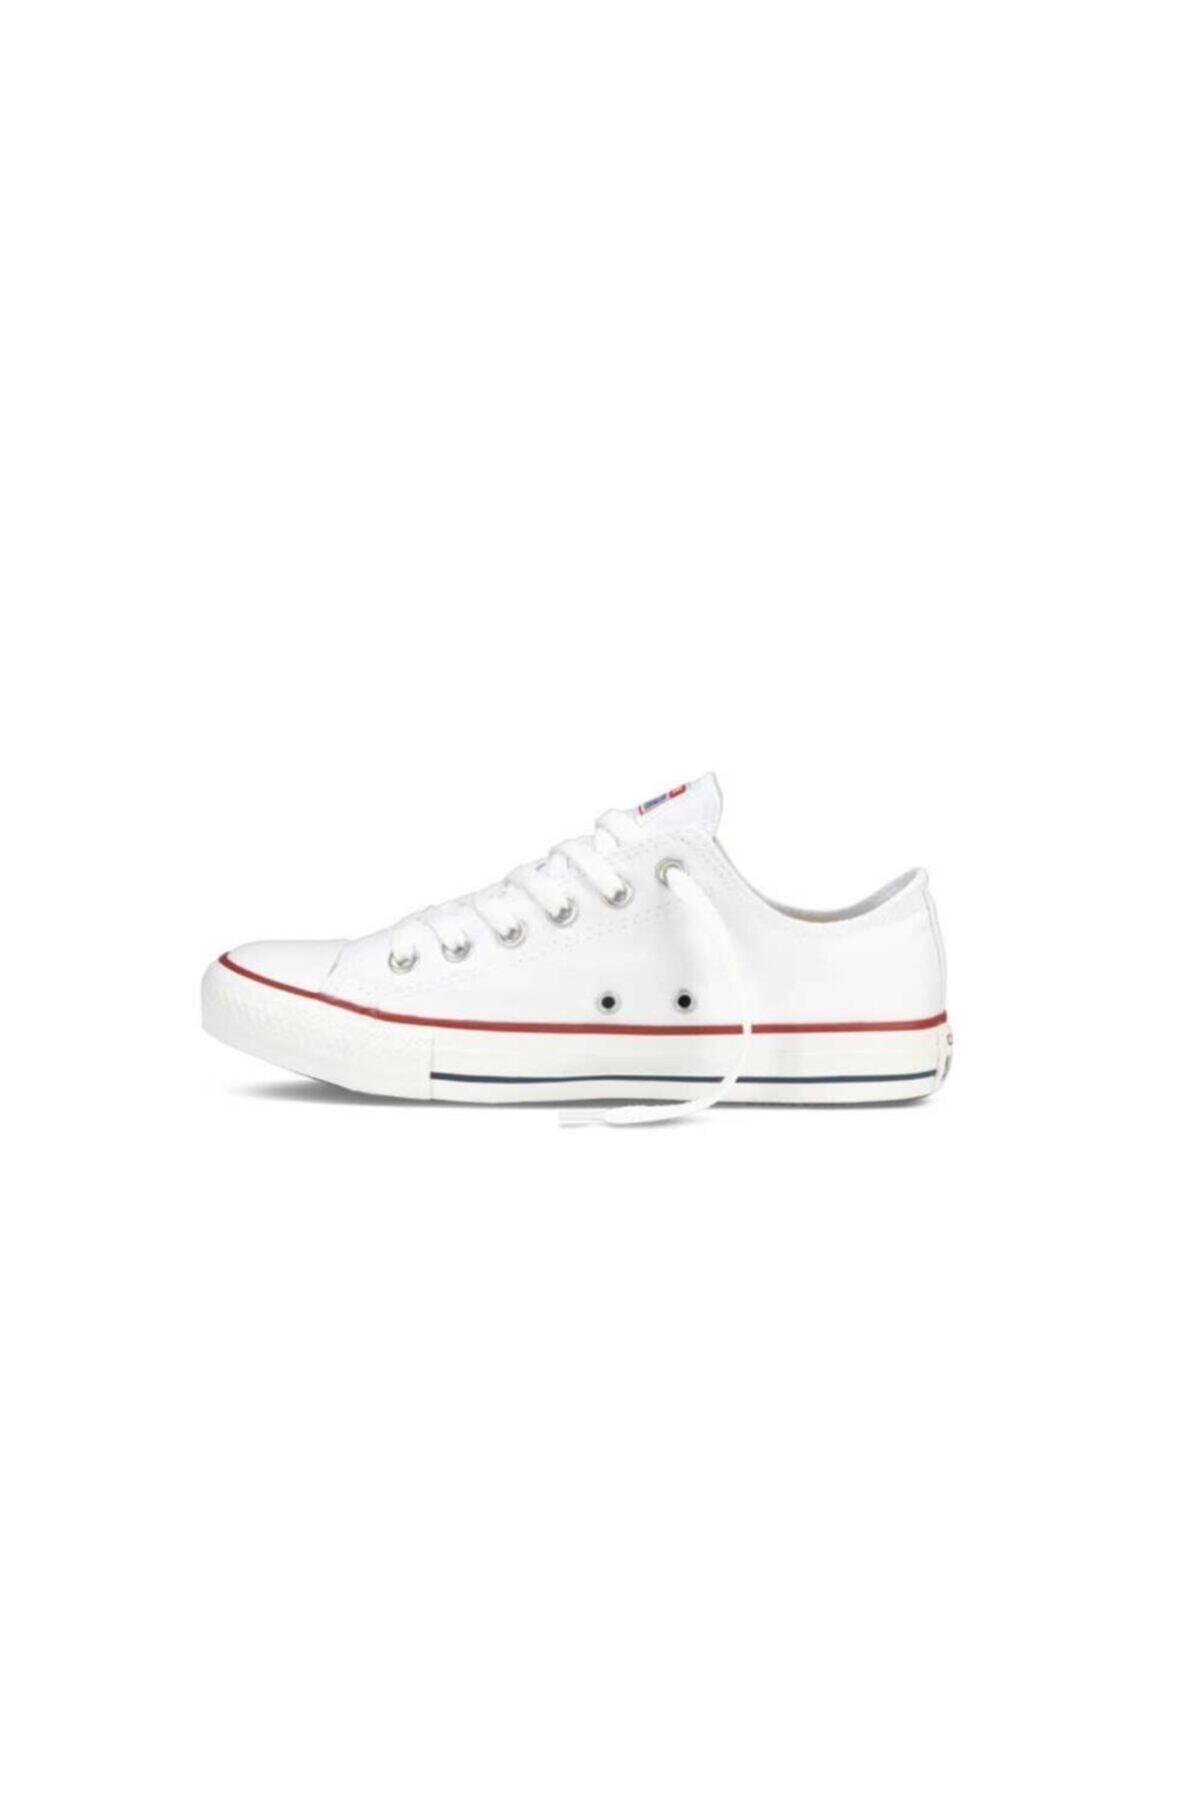 converse Kadın Beyaz Sneaker M7652c Chuck Taylor All Star Optıcal White Canvas 2